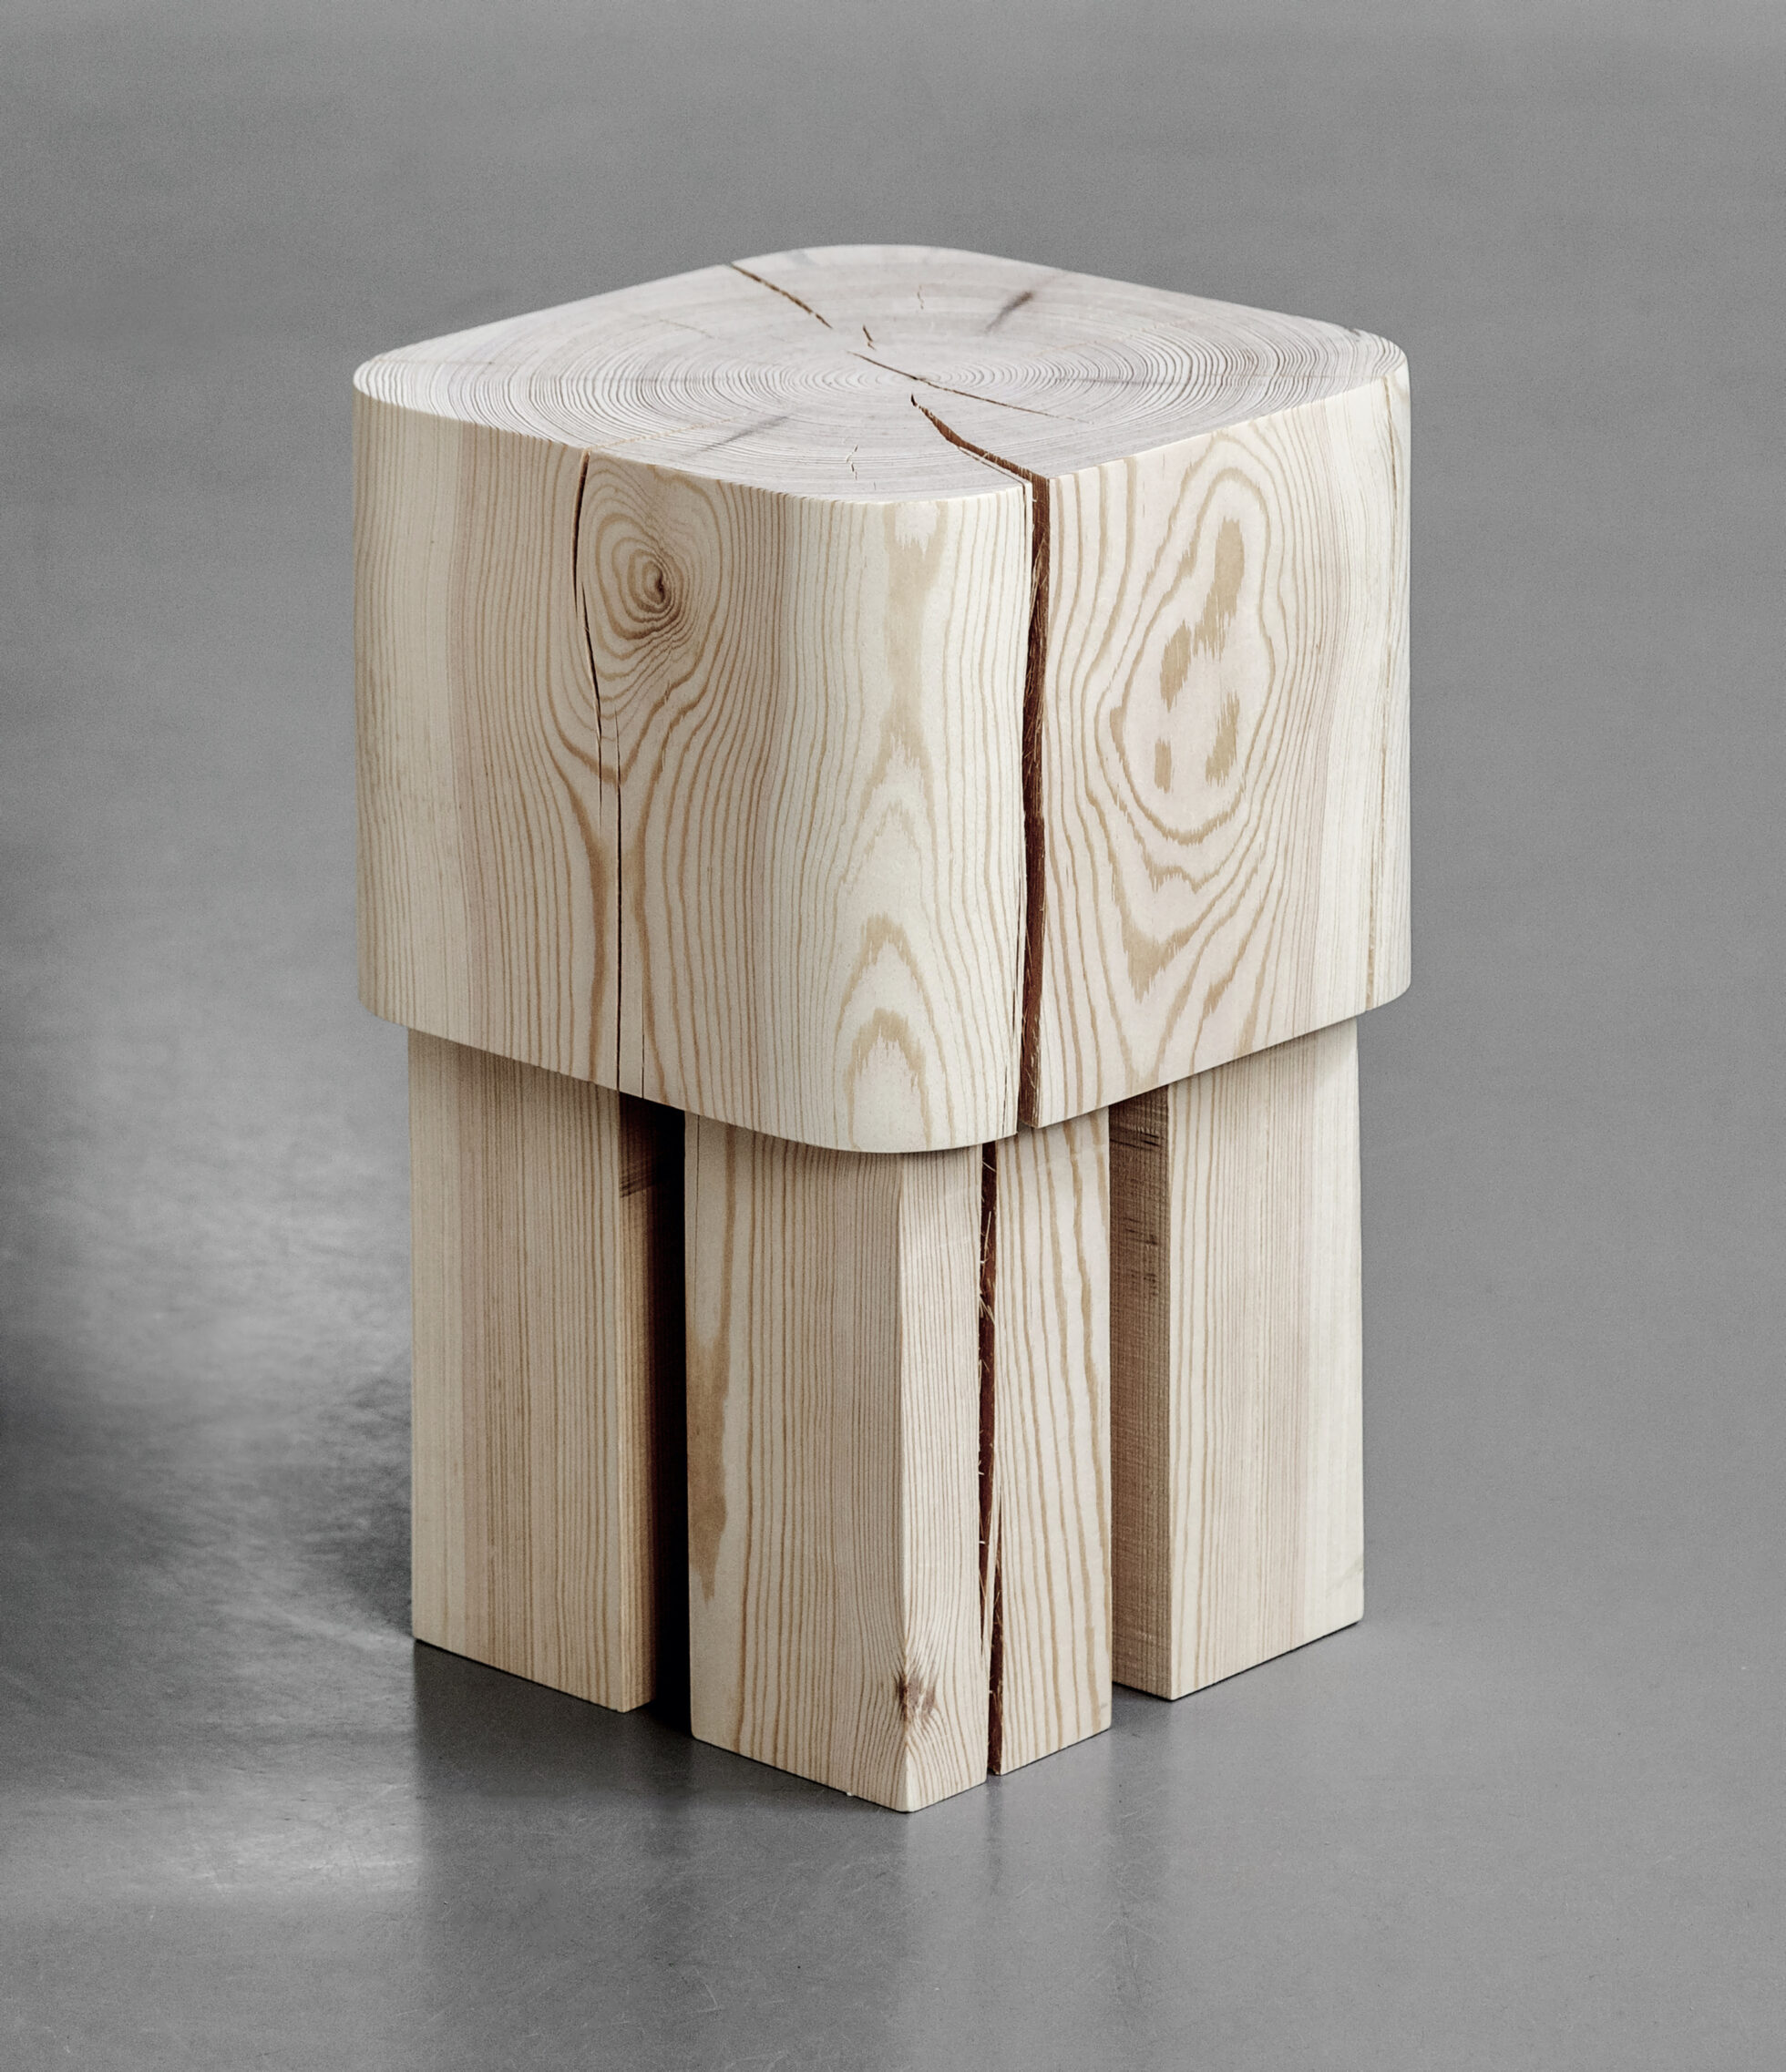 Pine stool love